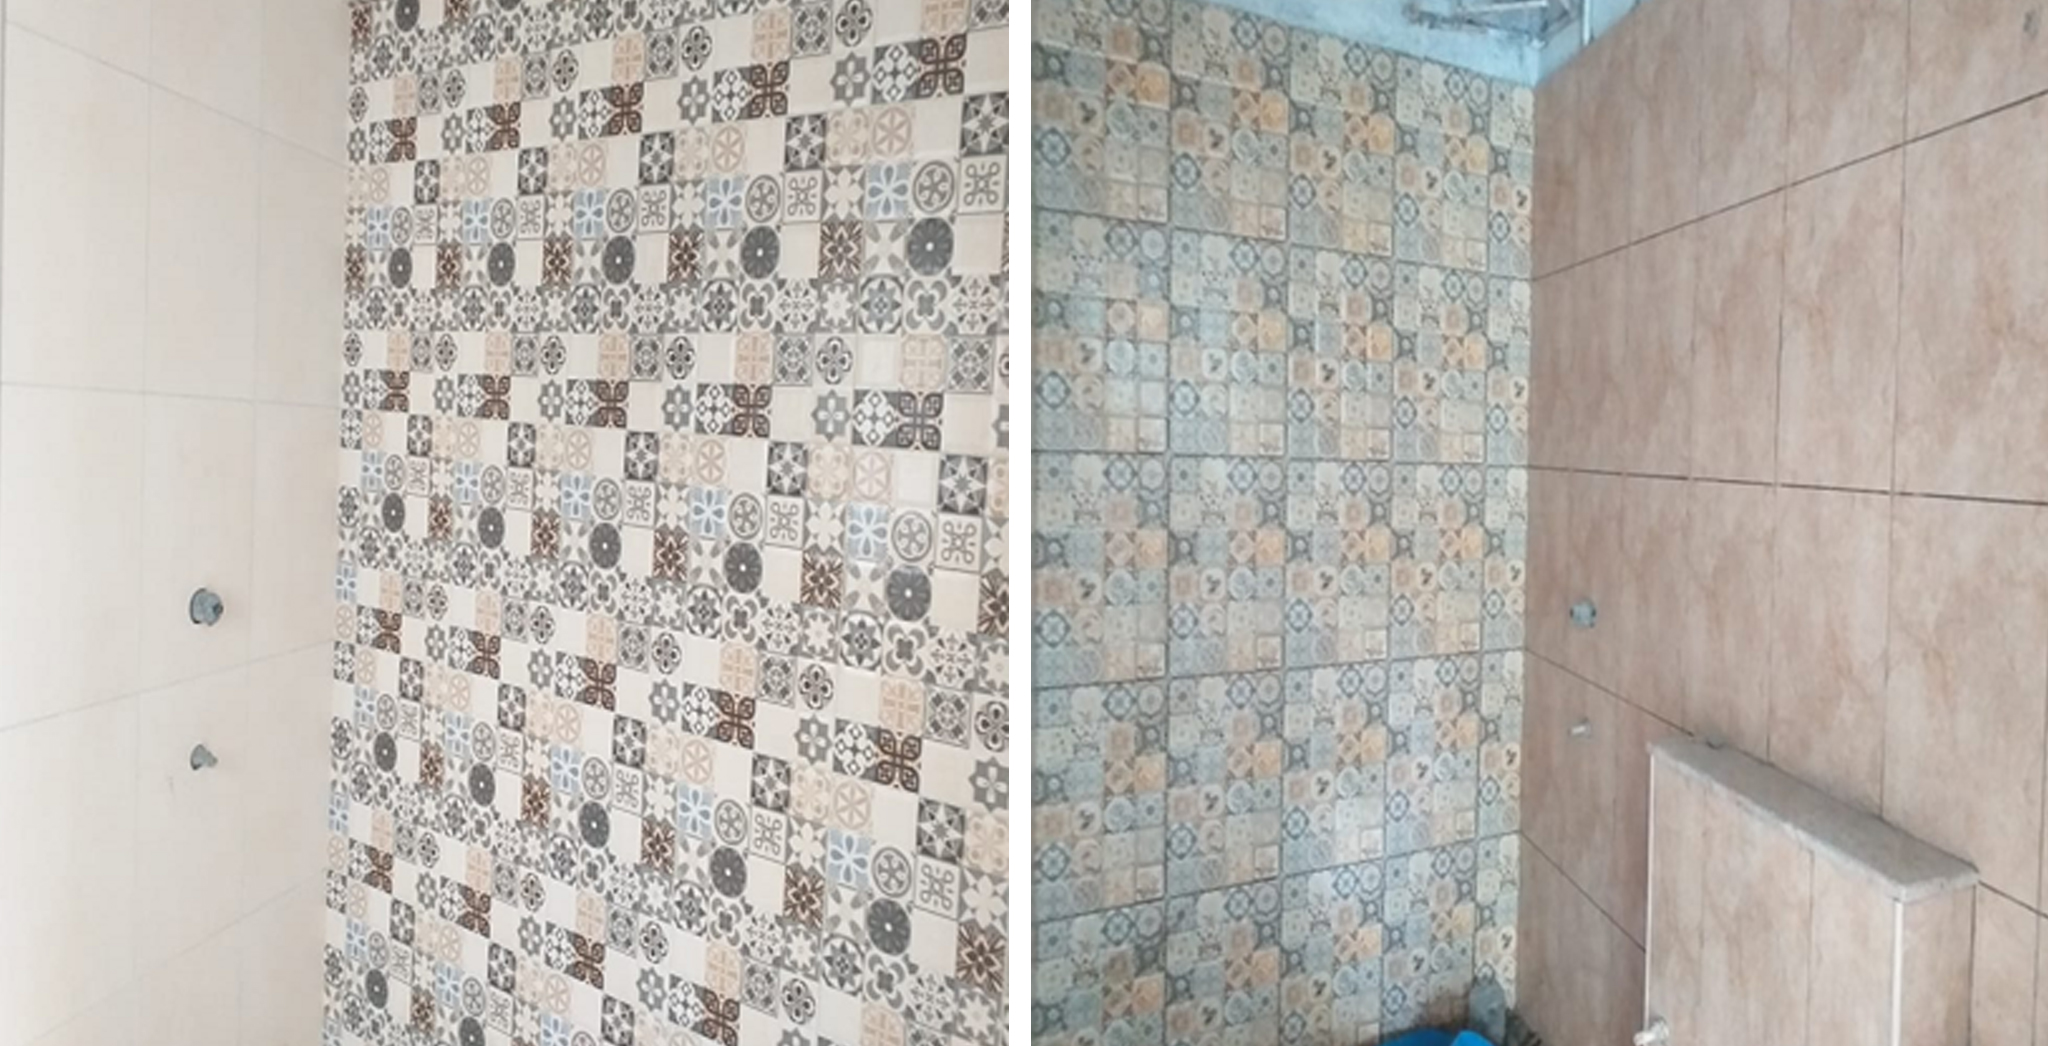 Aug 2021 - Block H & G: Toilet dado Works in progress